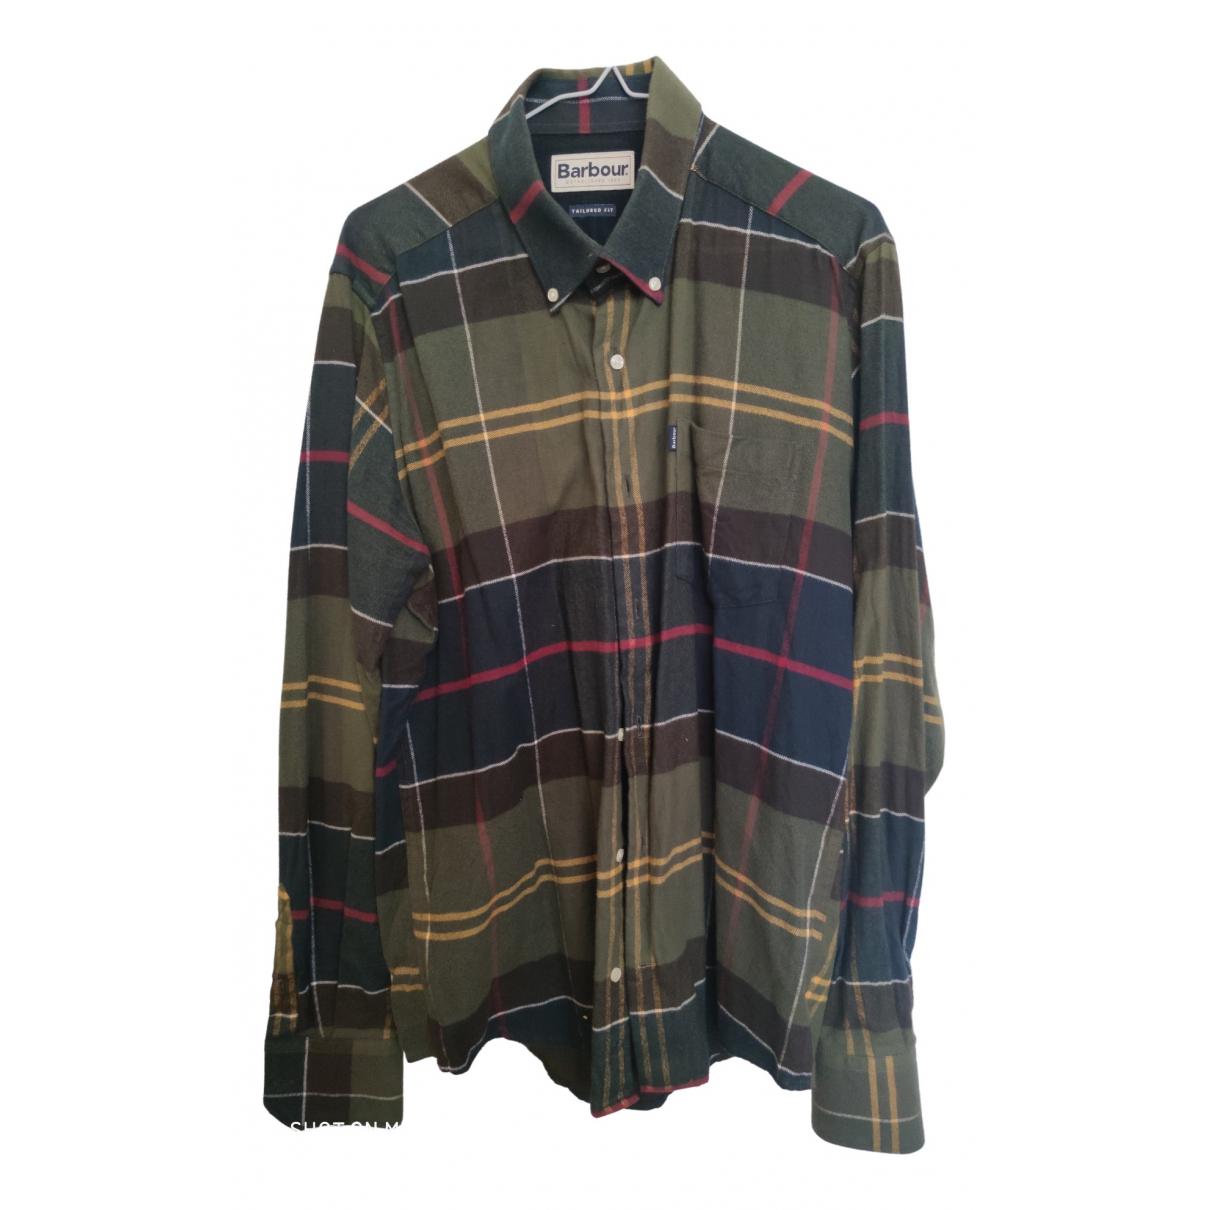 Barbour \N Cotton Shirts for Men M International